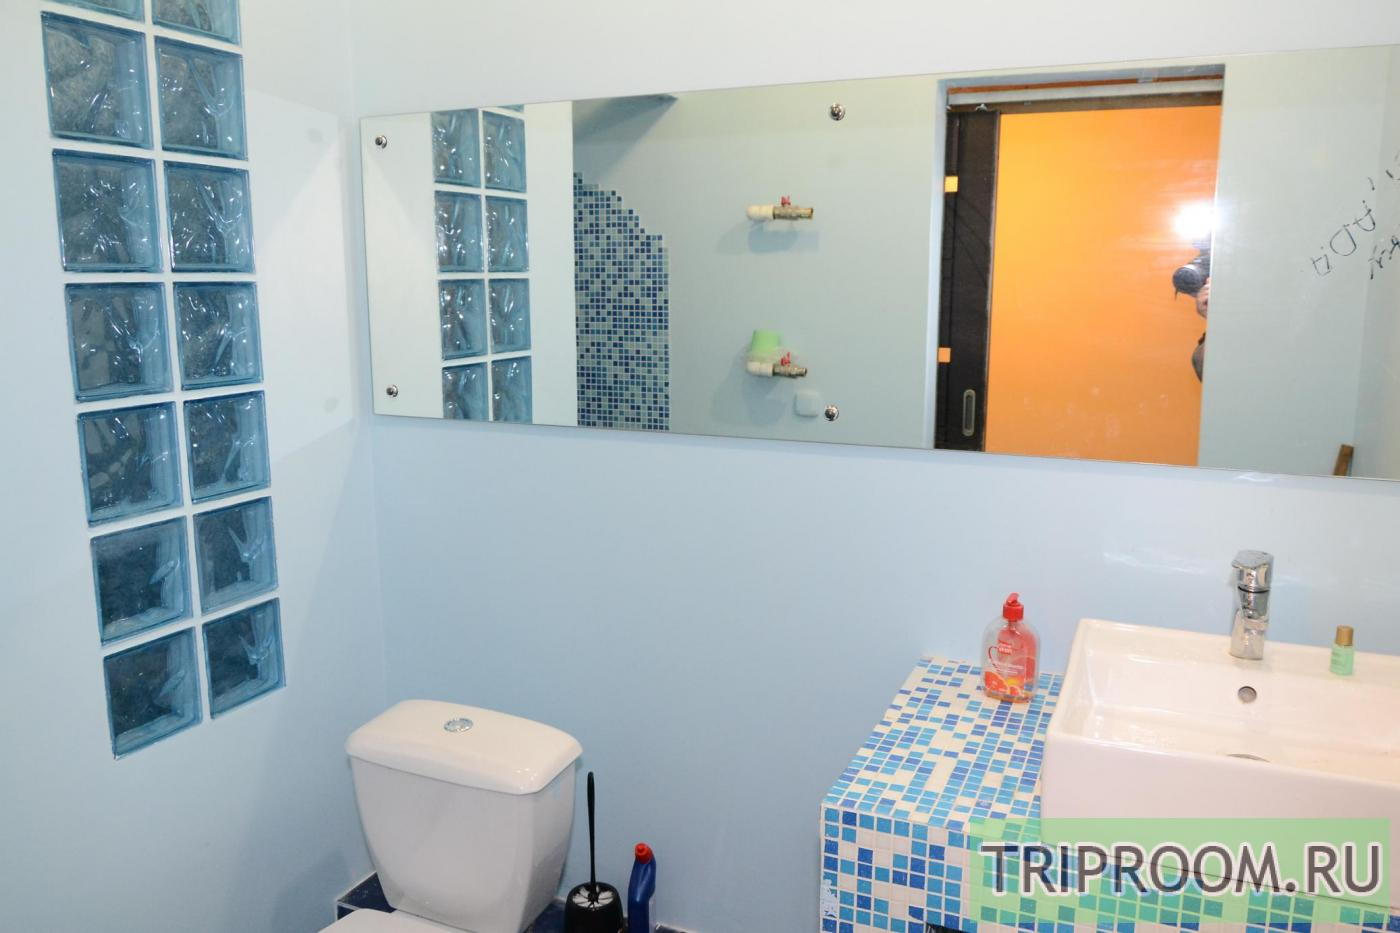 1-комнатная квартира посуточно (вариант № 14712), ул. Петра Смородина улица, фото № 10